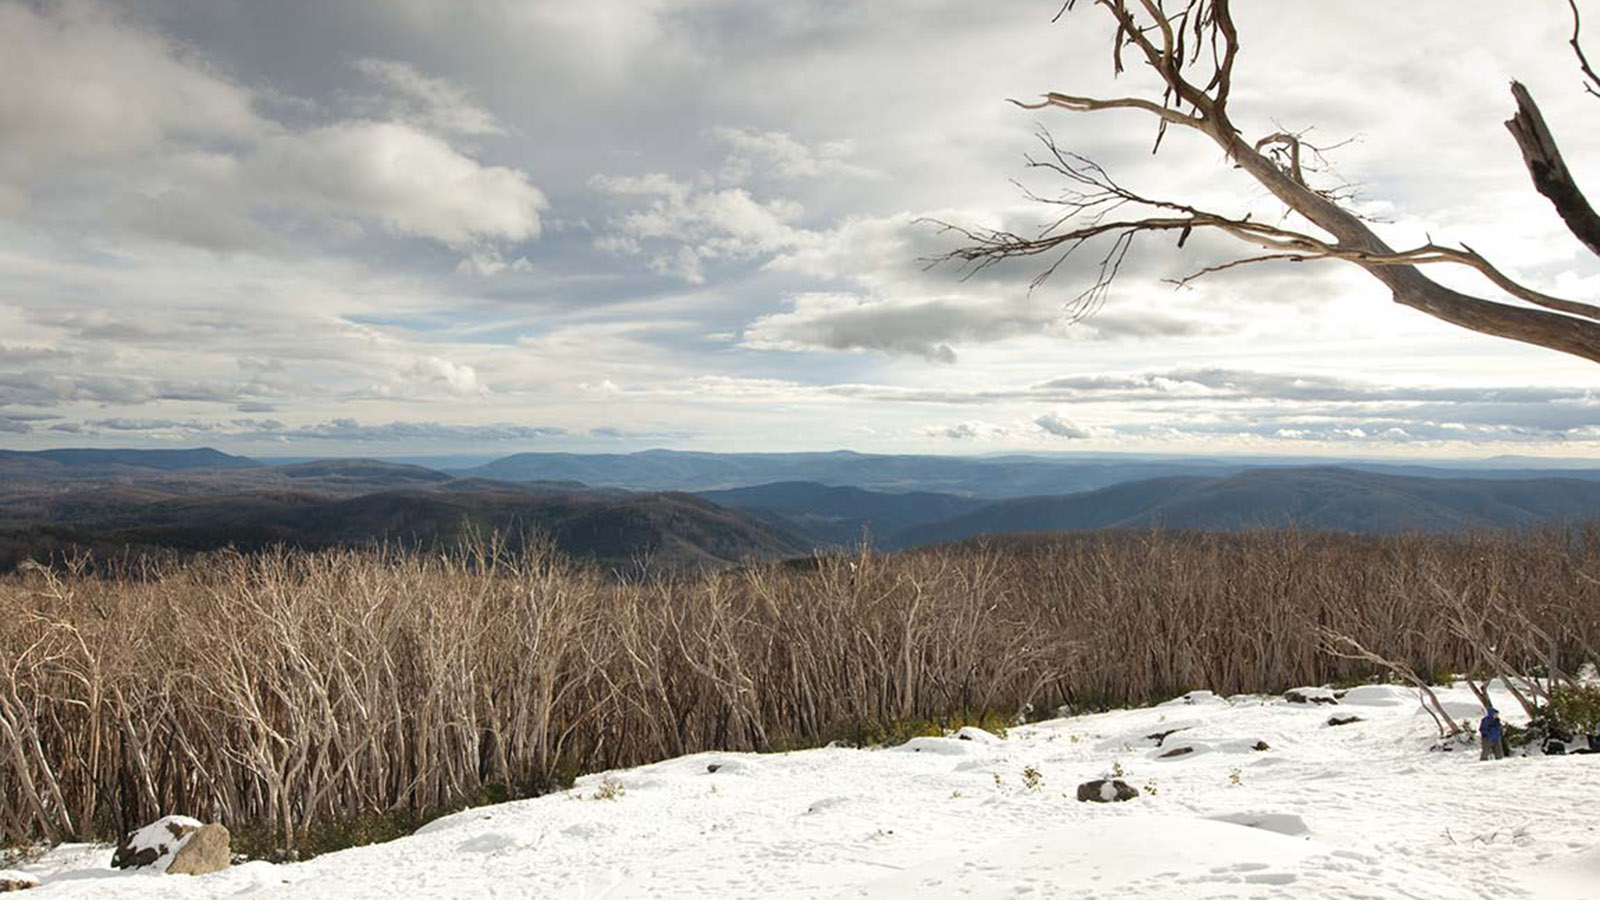 Lake Mountain, Yarra Valley & Dandenong Ranges, Victoria, Australia